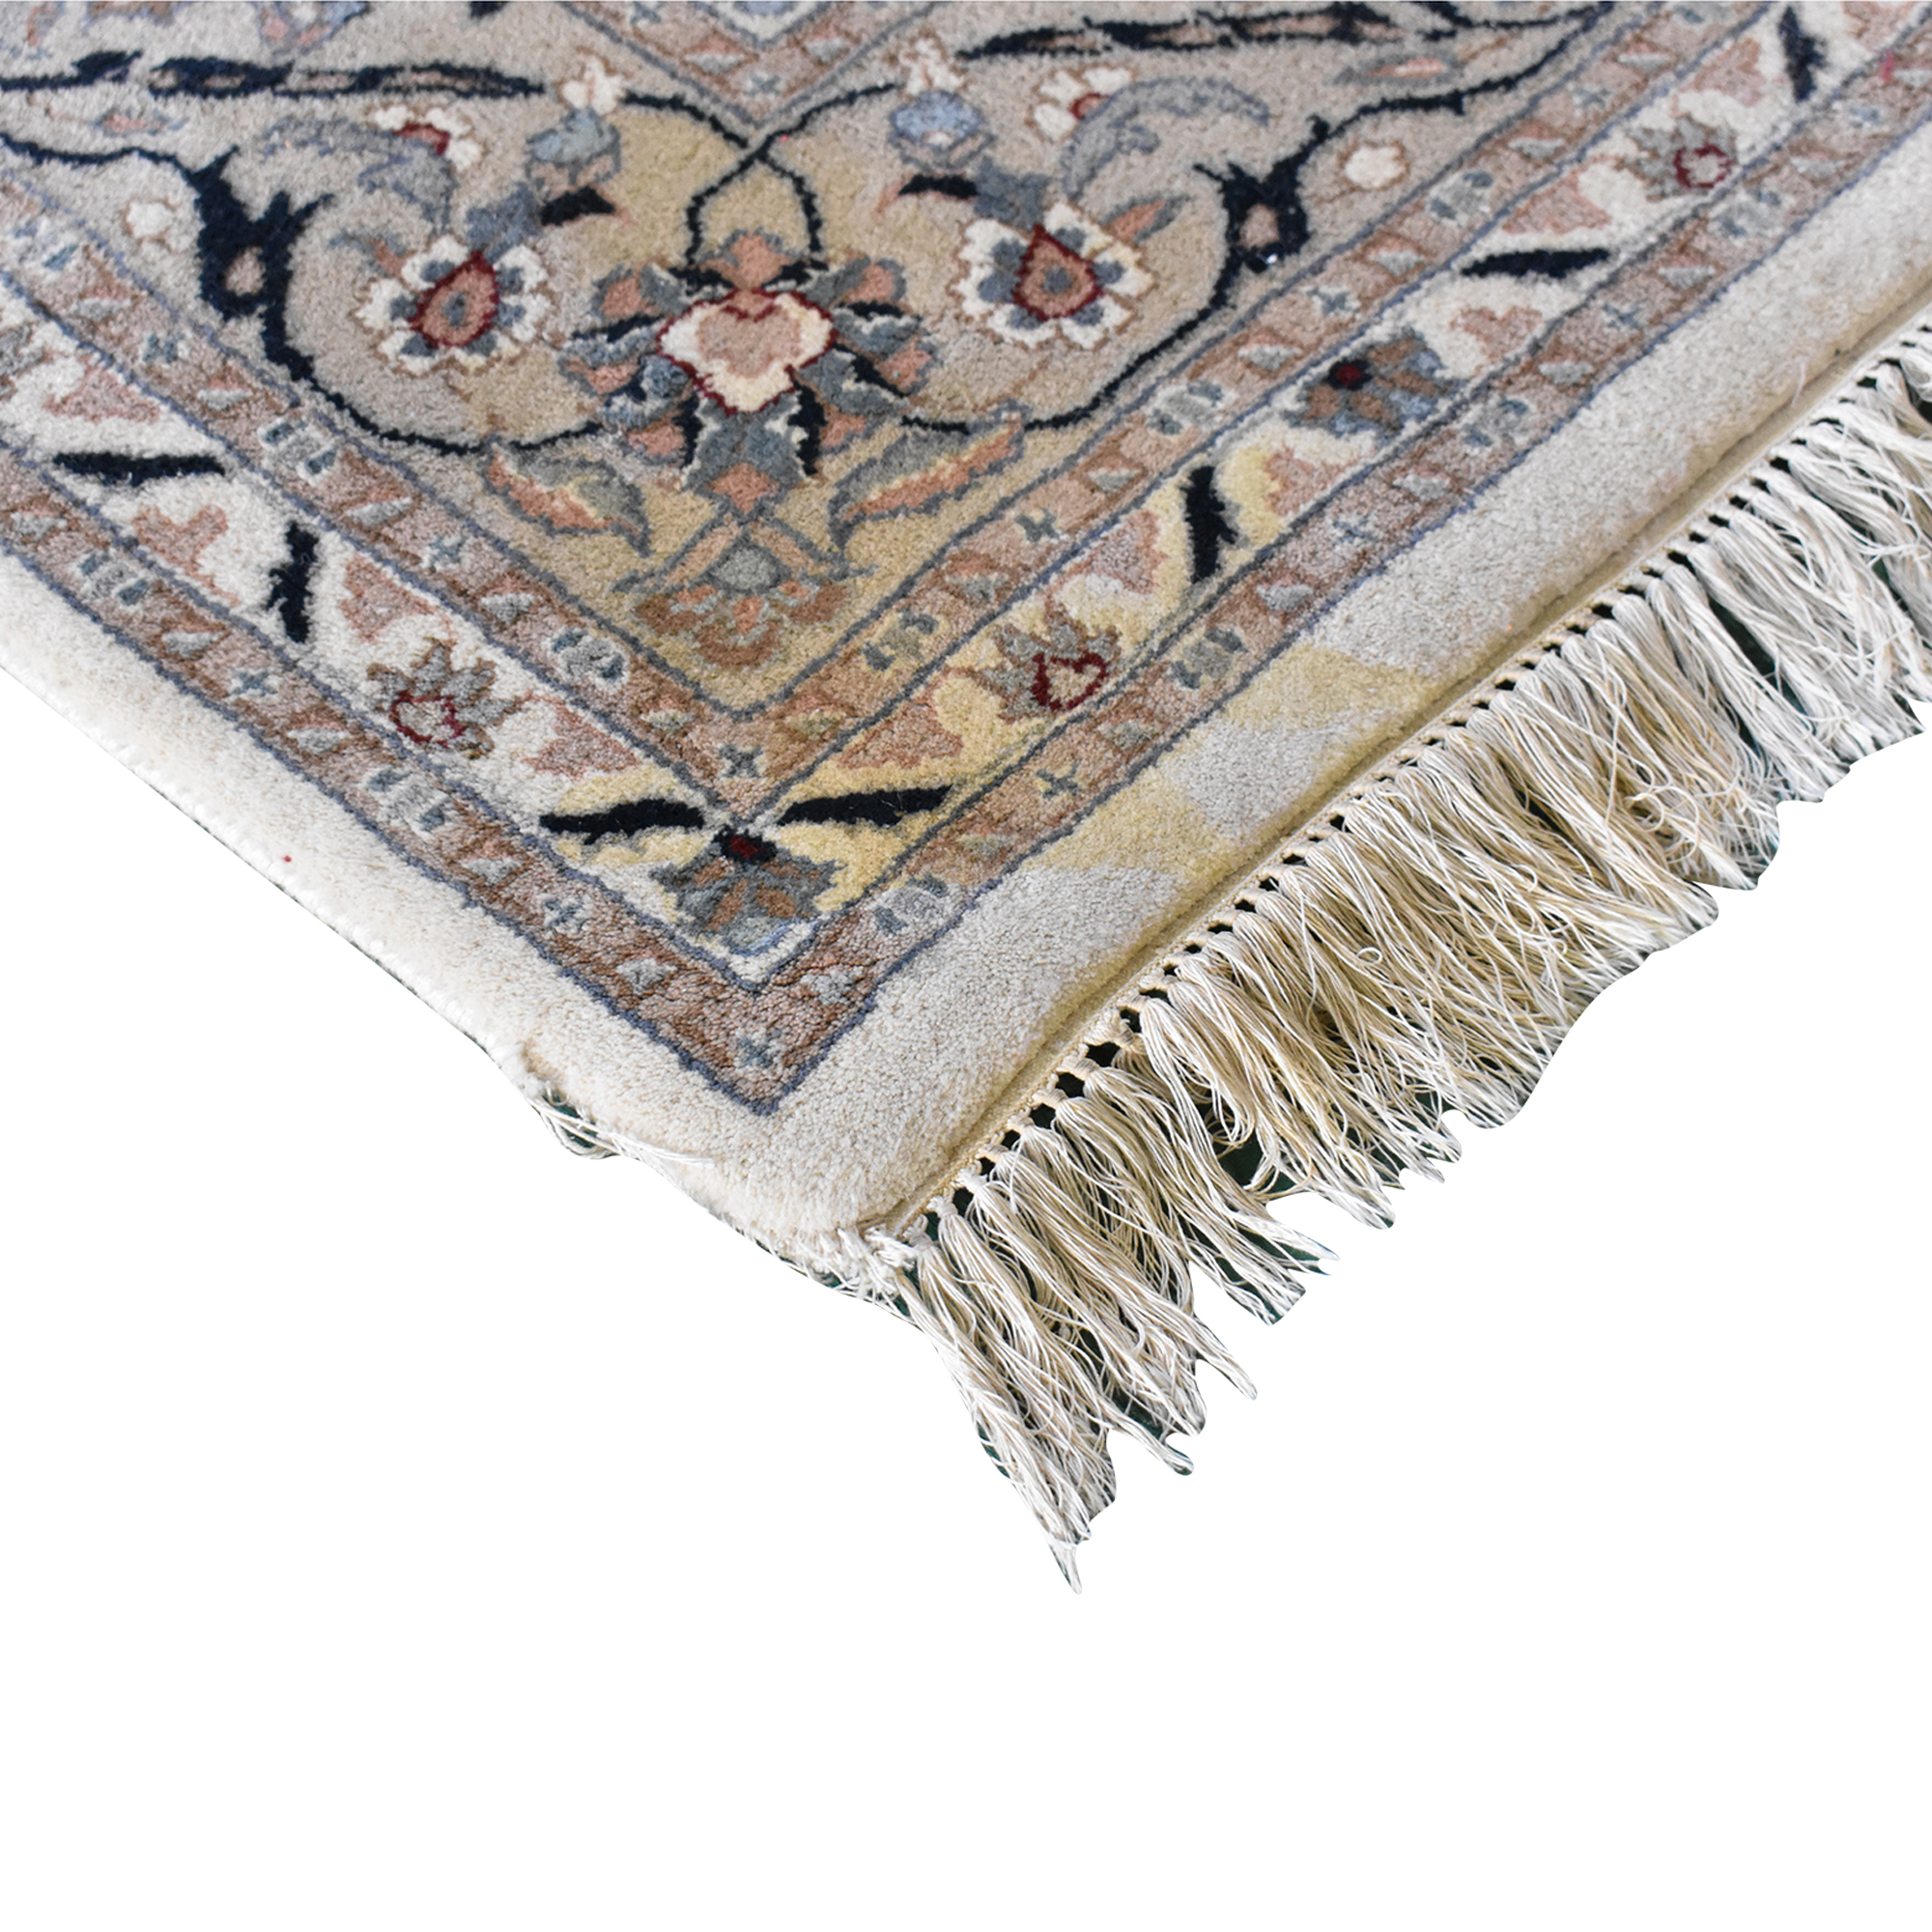 ABC Carpet & Home ABC Carpet & Home Area Rug for sale